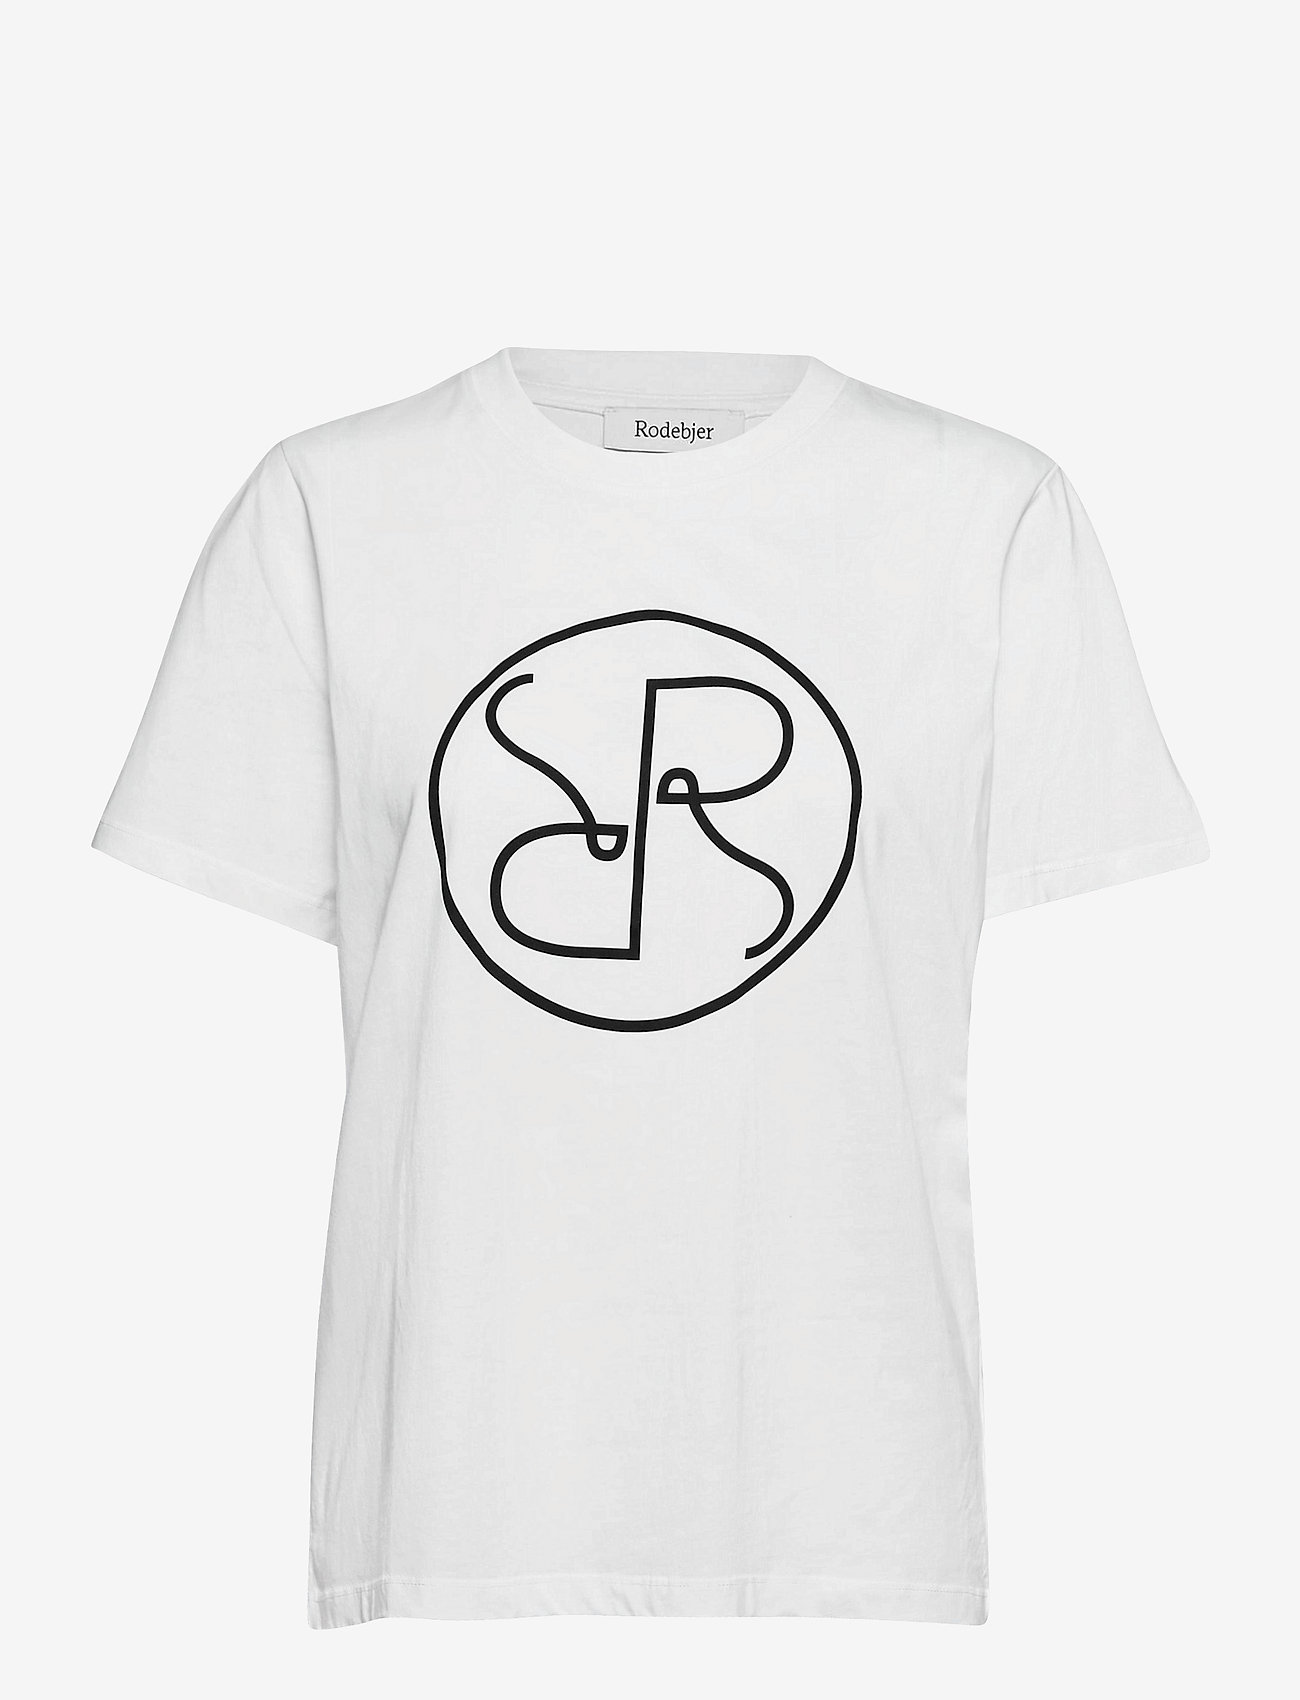 RODEBJER - RODEBJER MONOGRAM T - t-shirts - white - 0